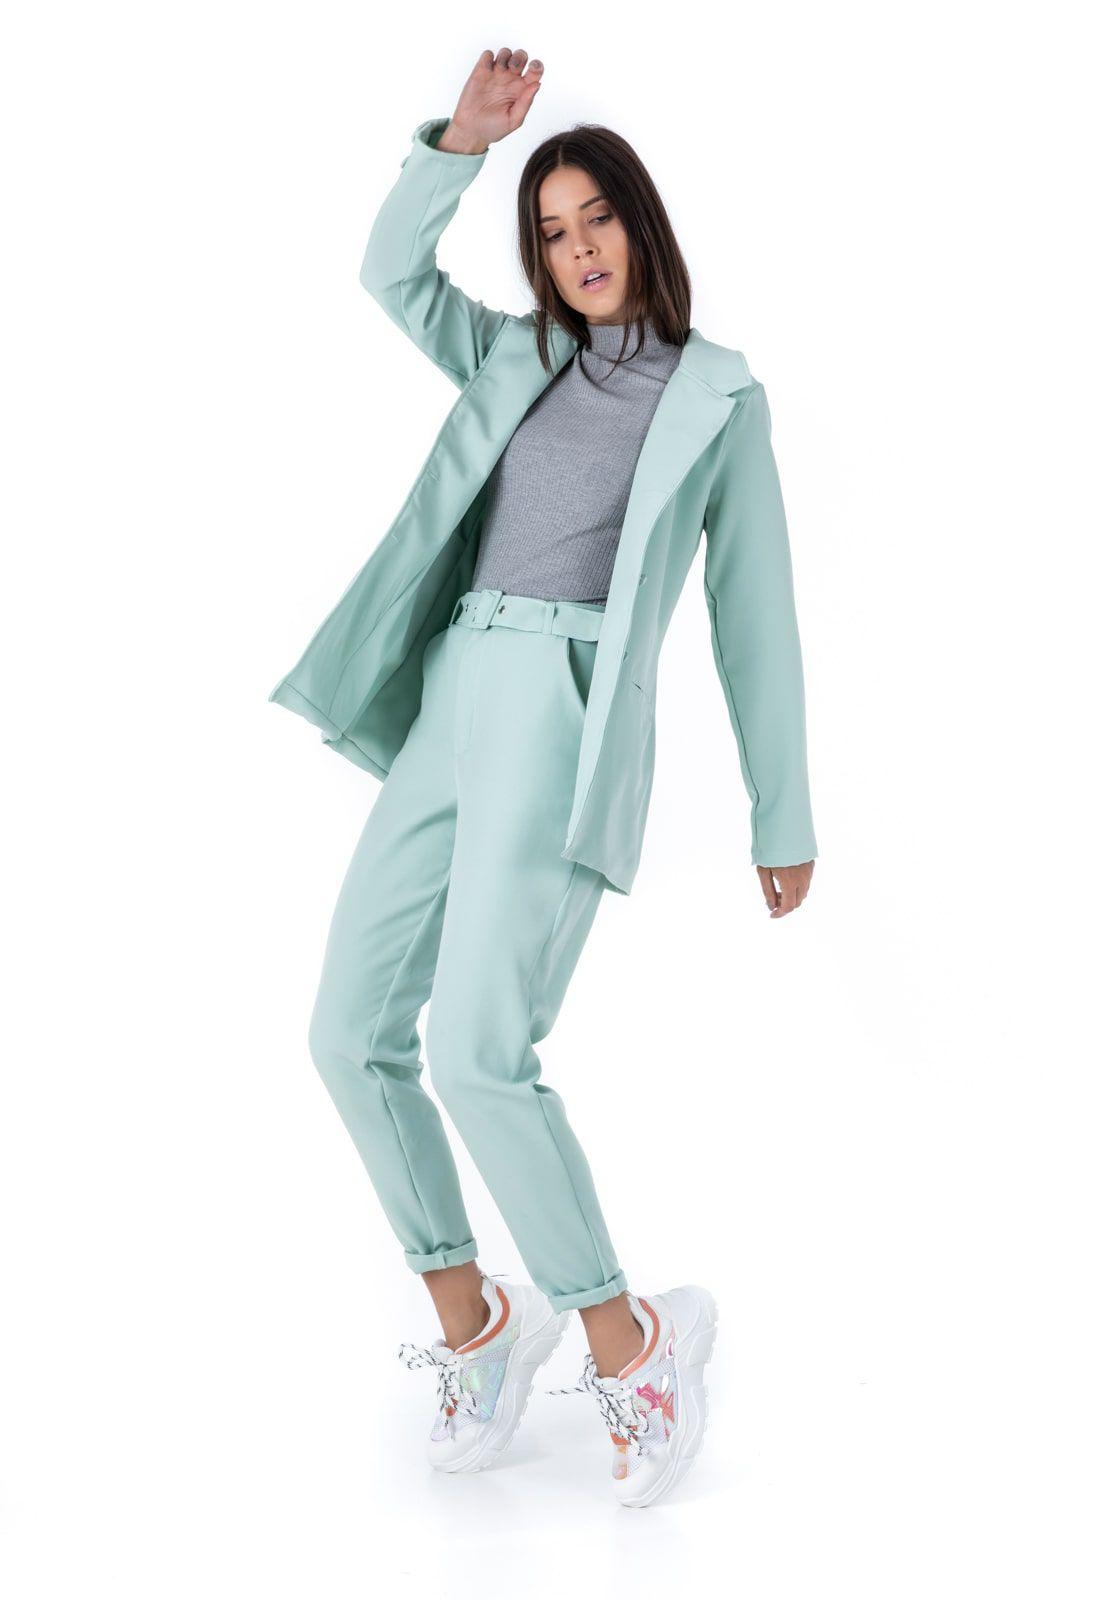 Blazer Feminino Alfaiataria Alongado Verde Mint Ciara Pkd